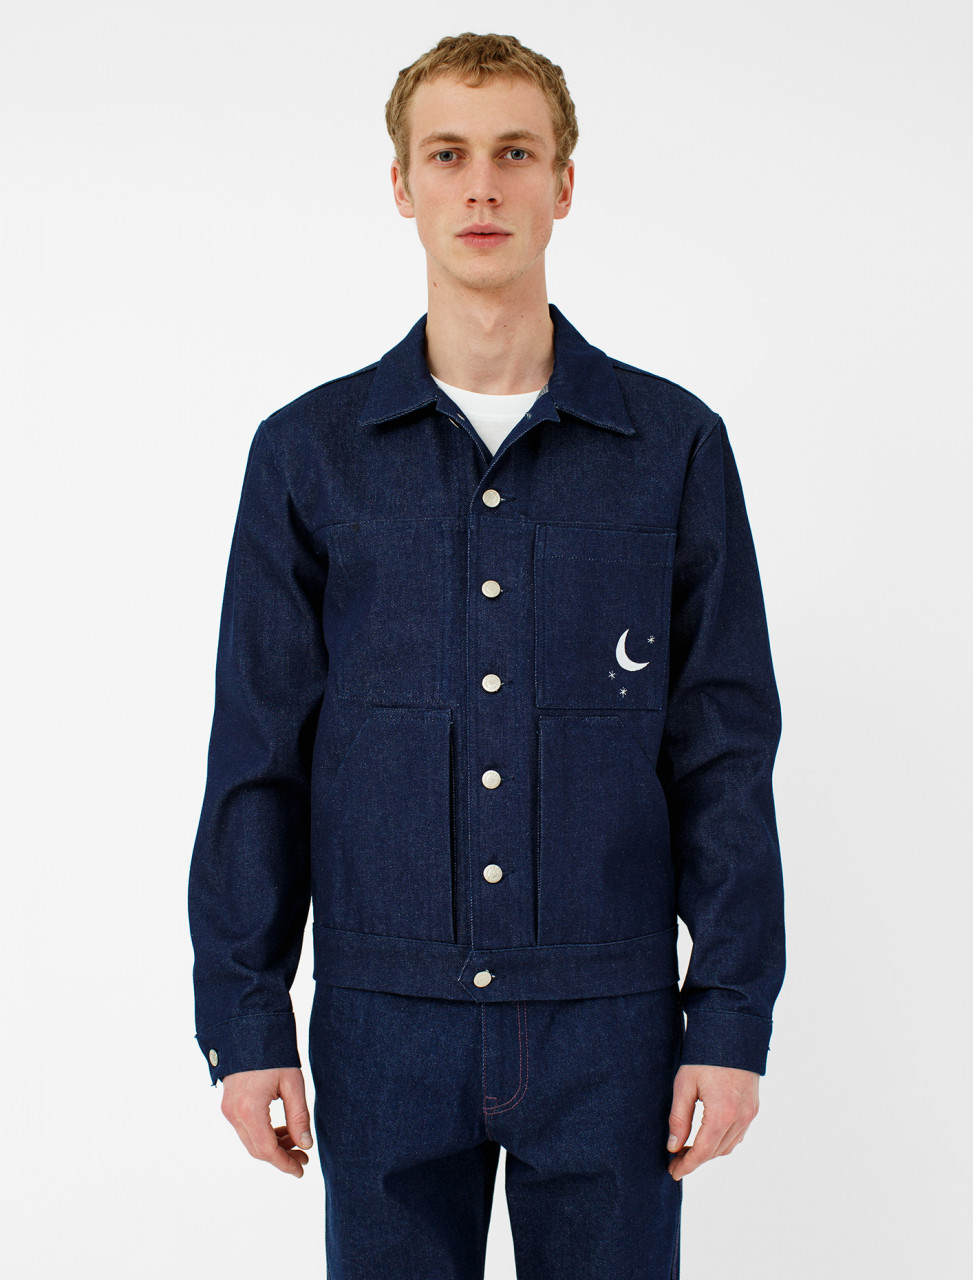 Bimbo Unchained Denim Jacket